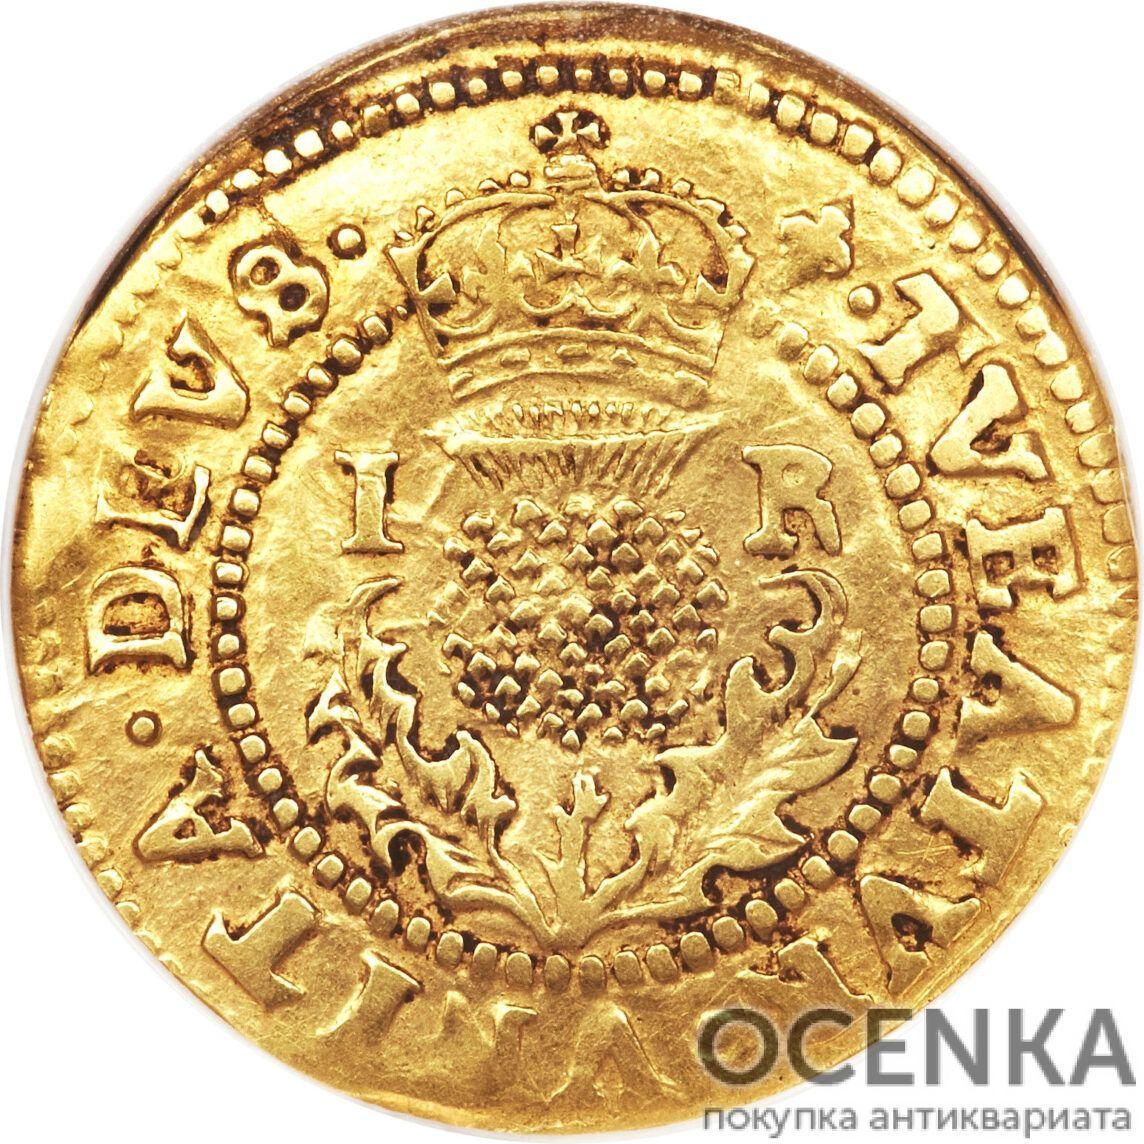 Золотая монета 1 Crown (крона) Великобритания - 1